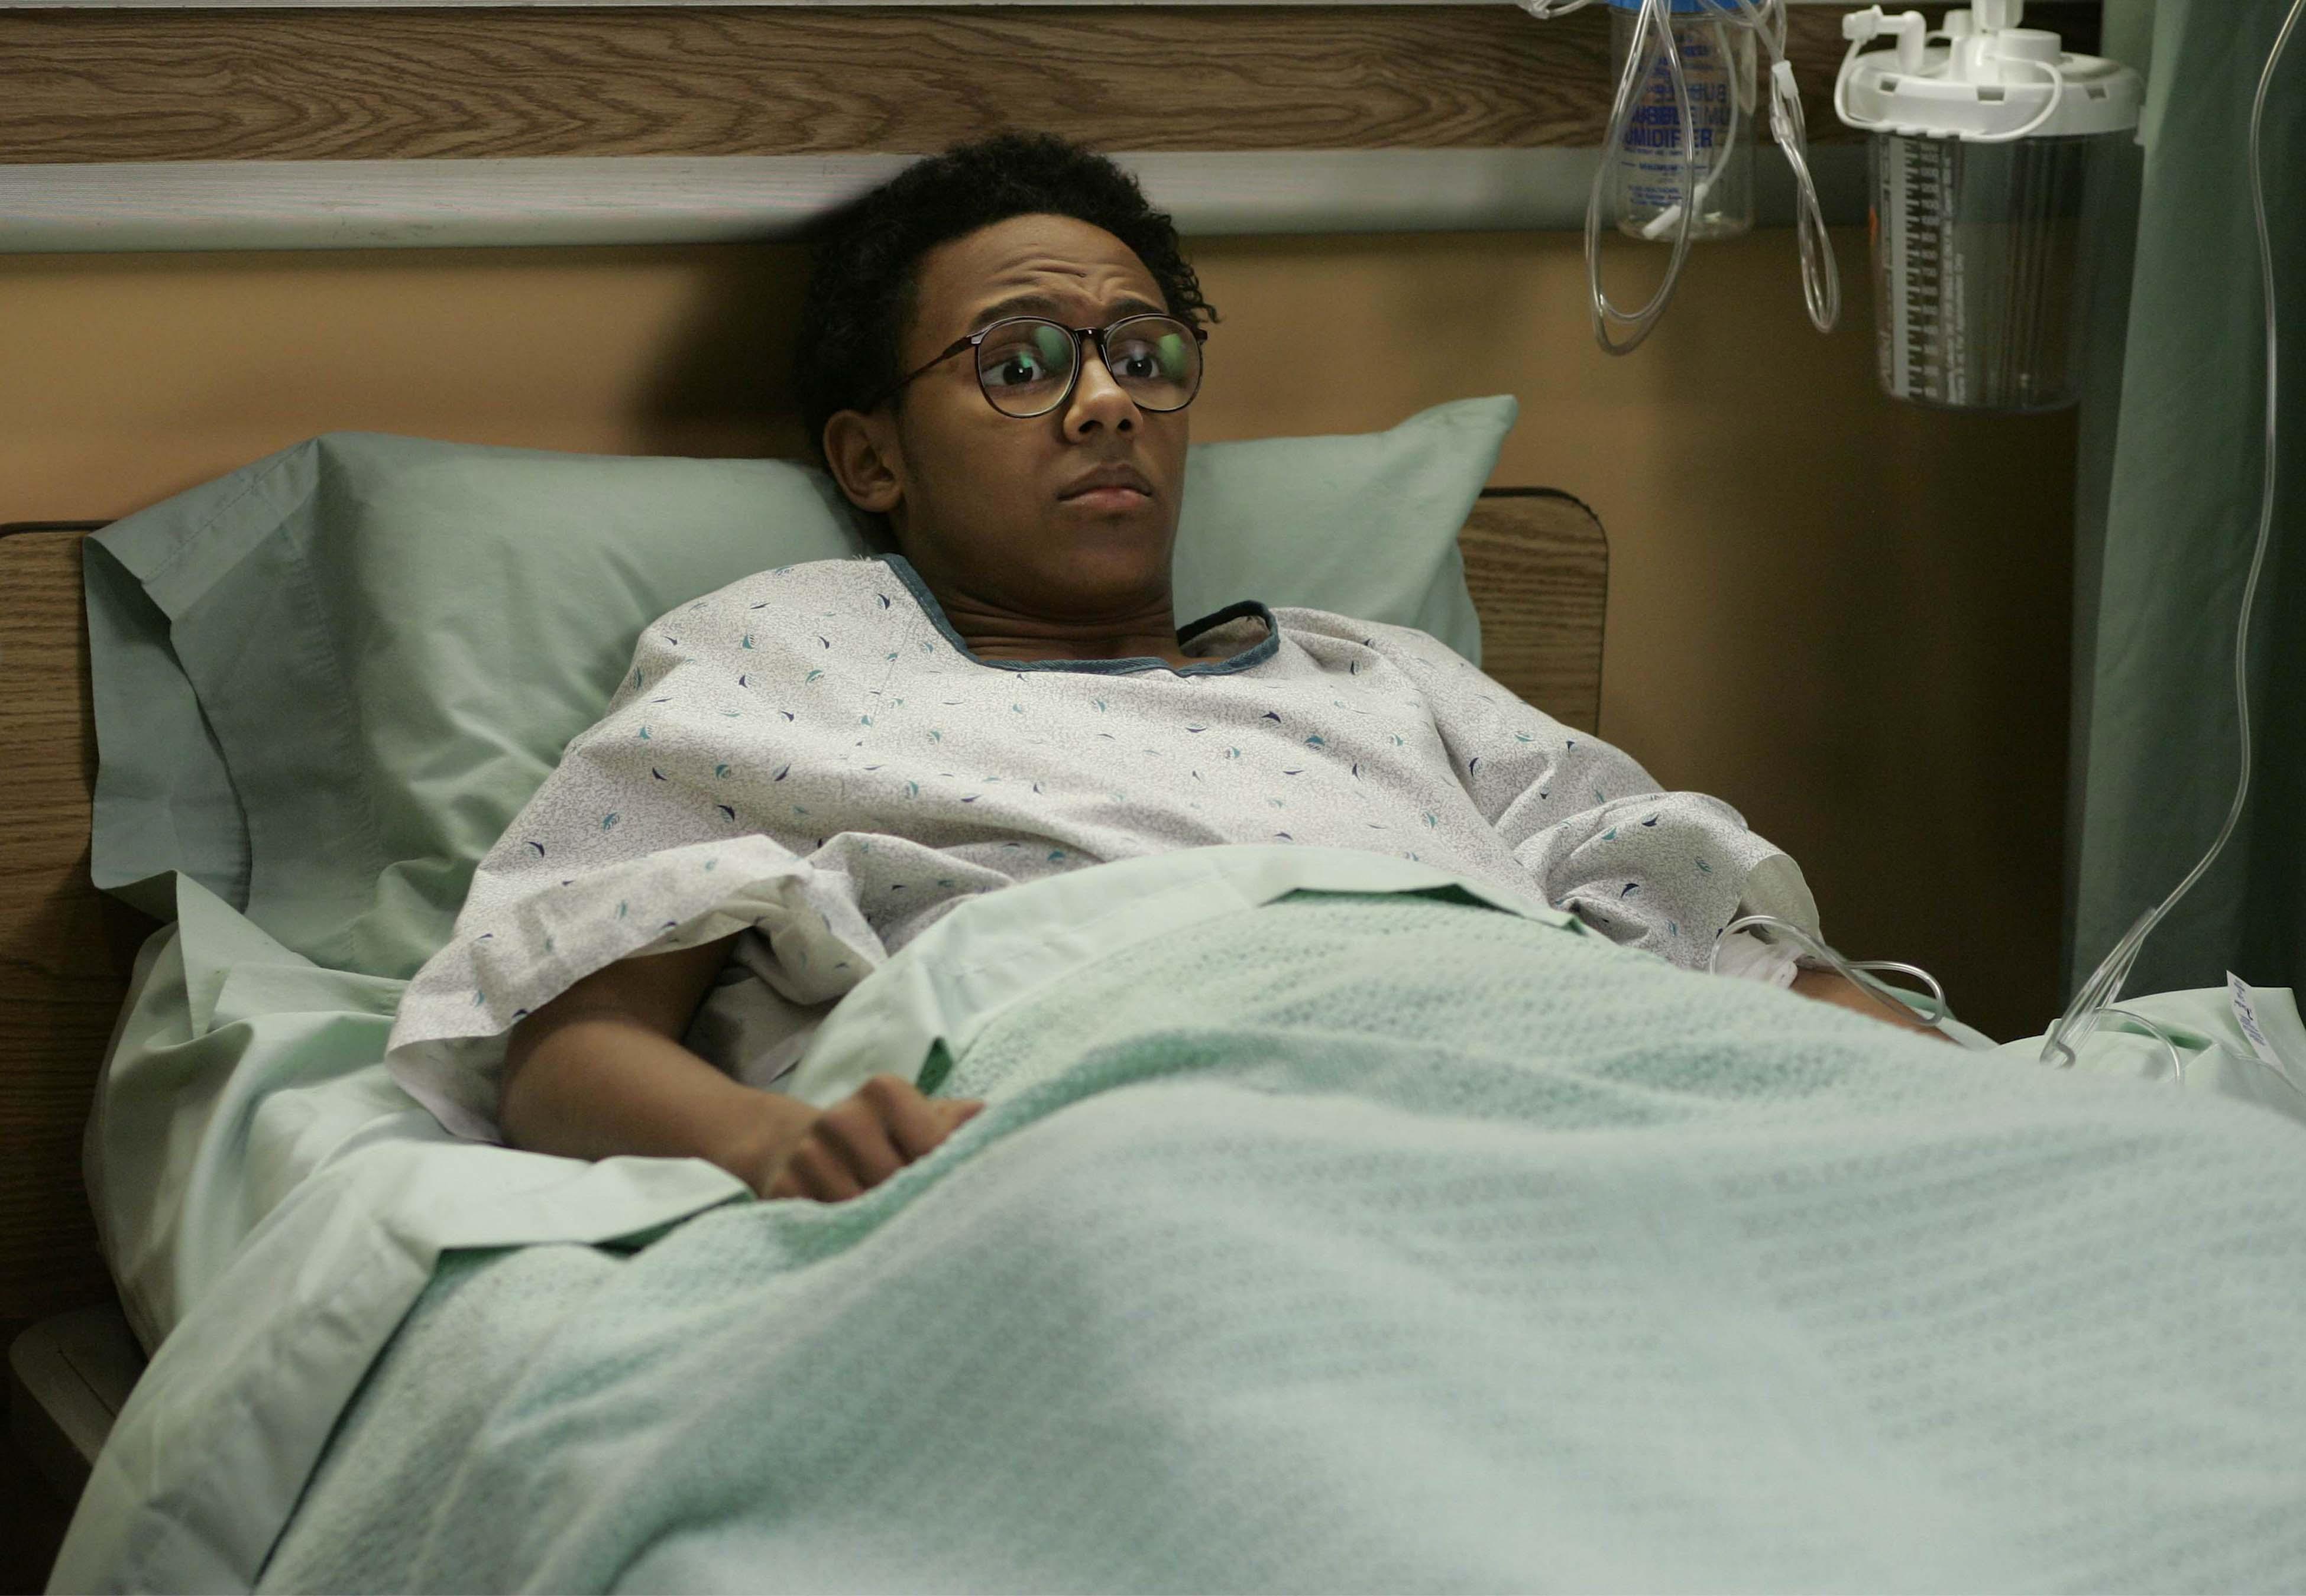 Stevie in the Hospital